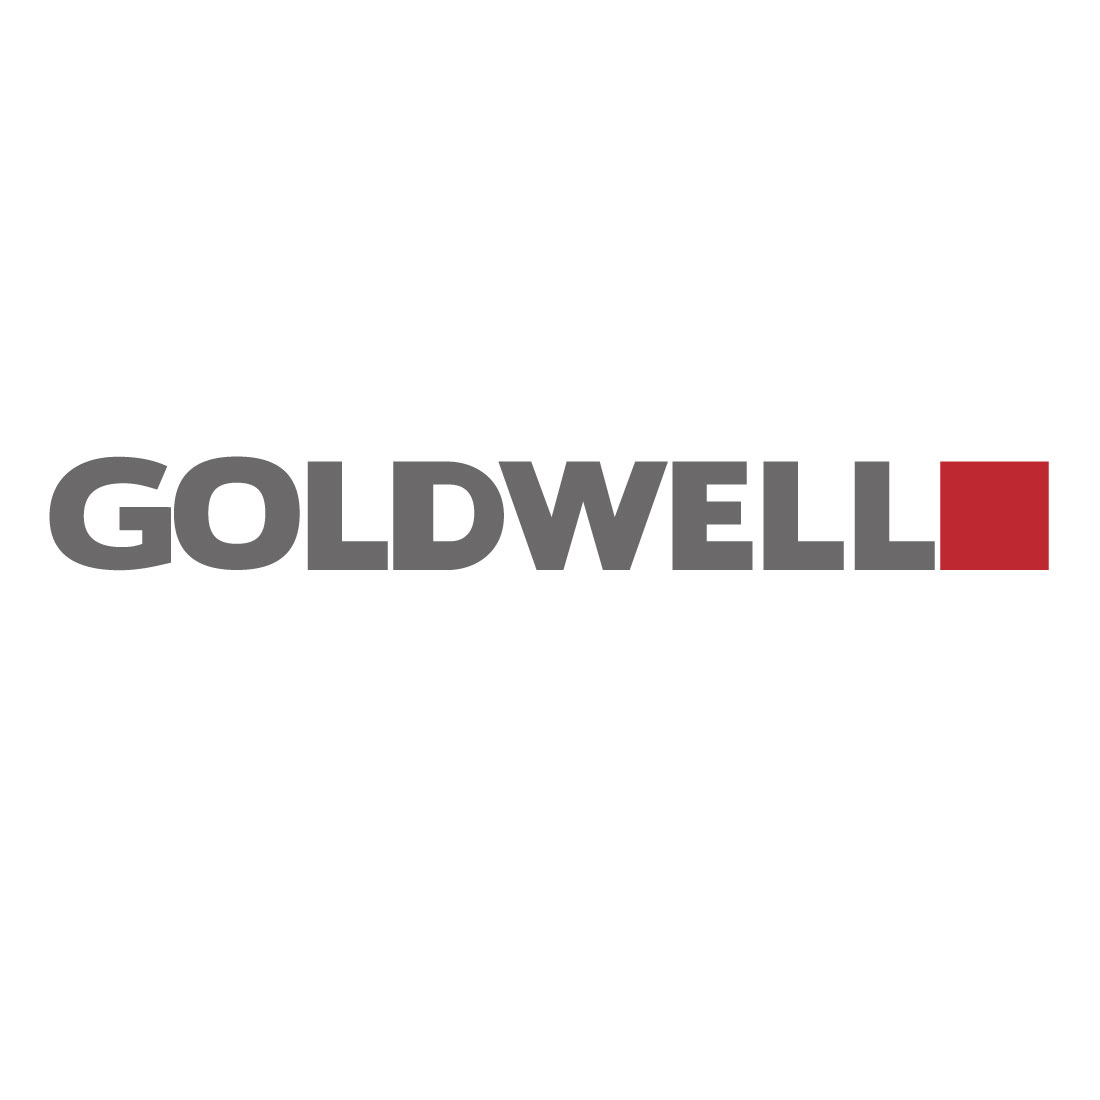 goldwell_1100